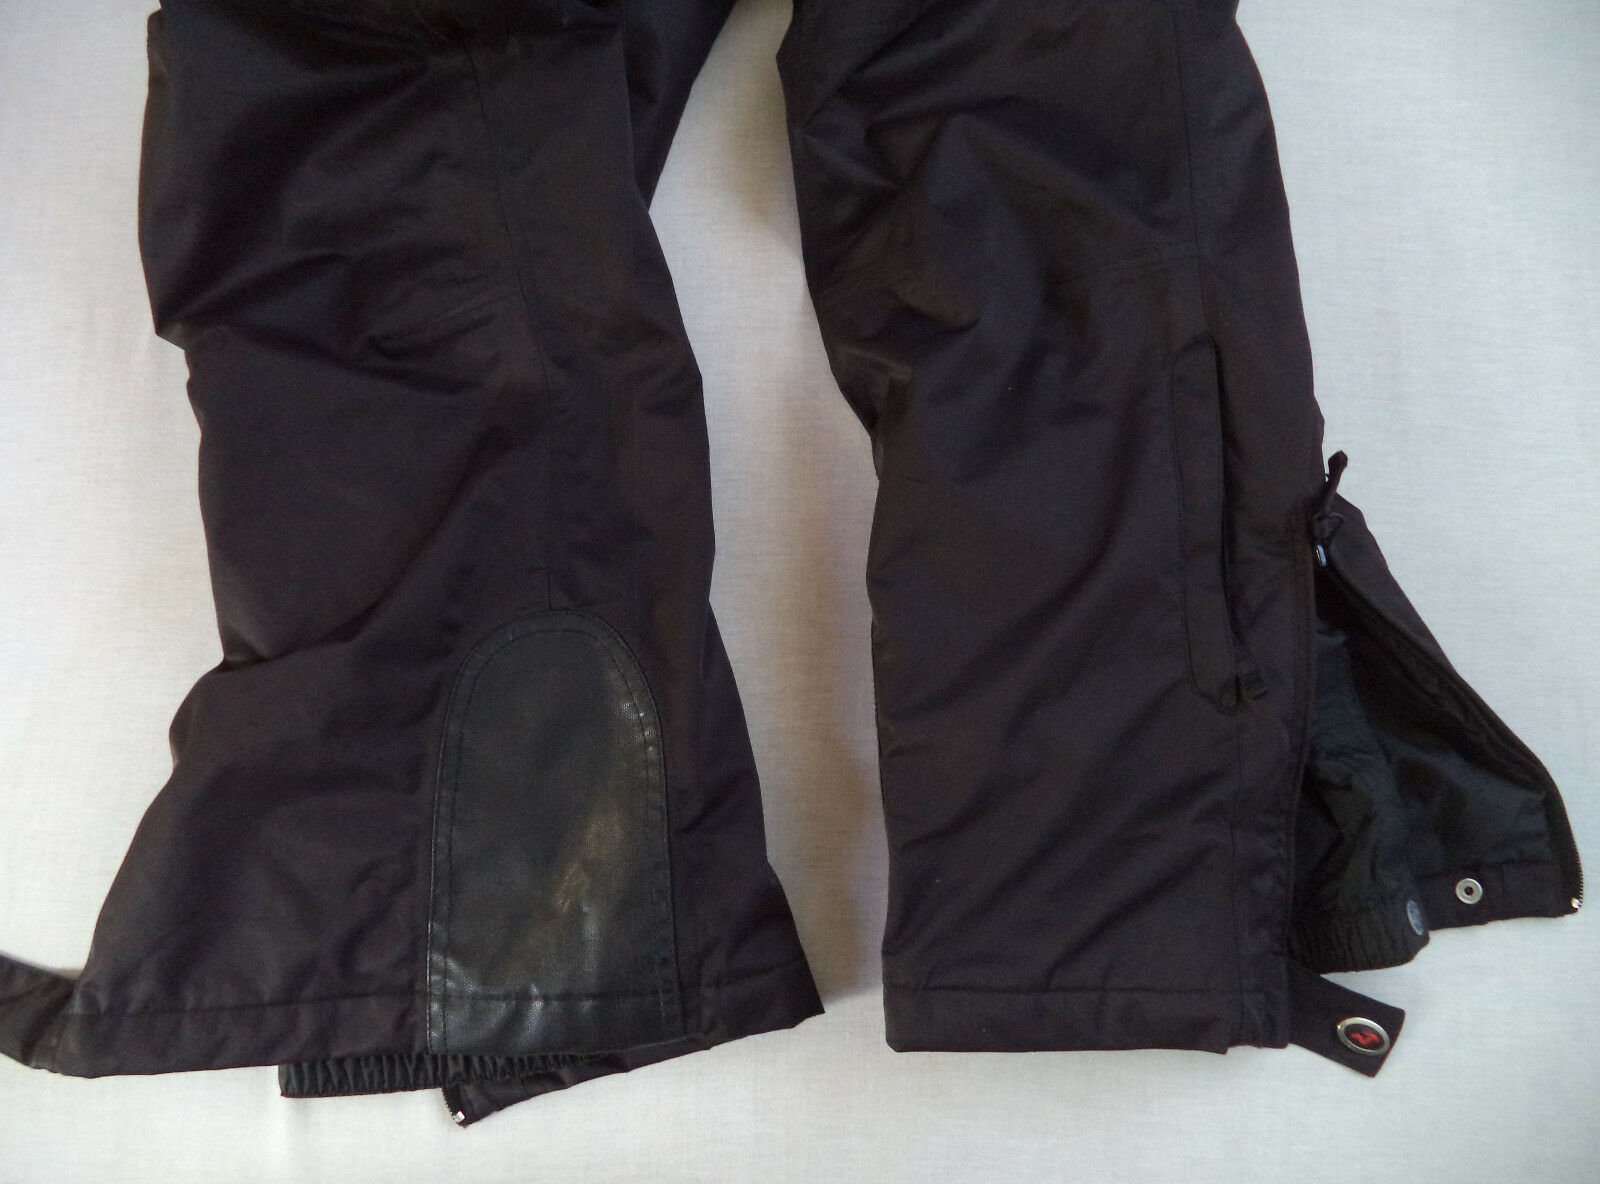 Mixed Intimate Items Earnest Handmade 100% Latex Rubber 0.48mm Dress Skirt Catsuit Suit Long Bodysuit Zip New